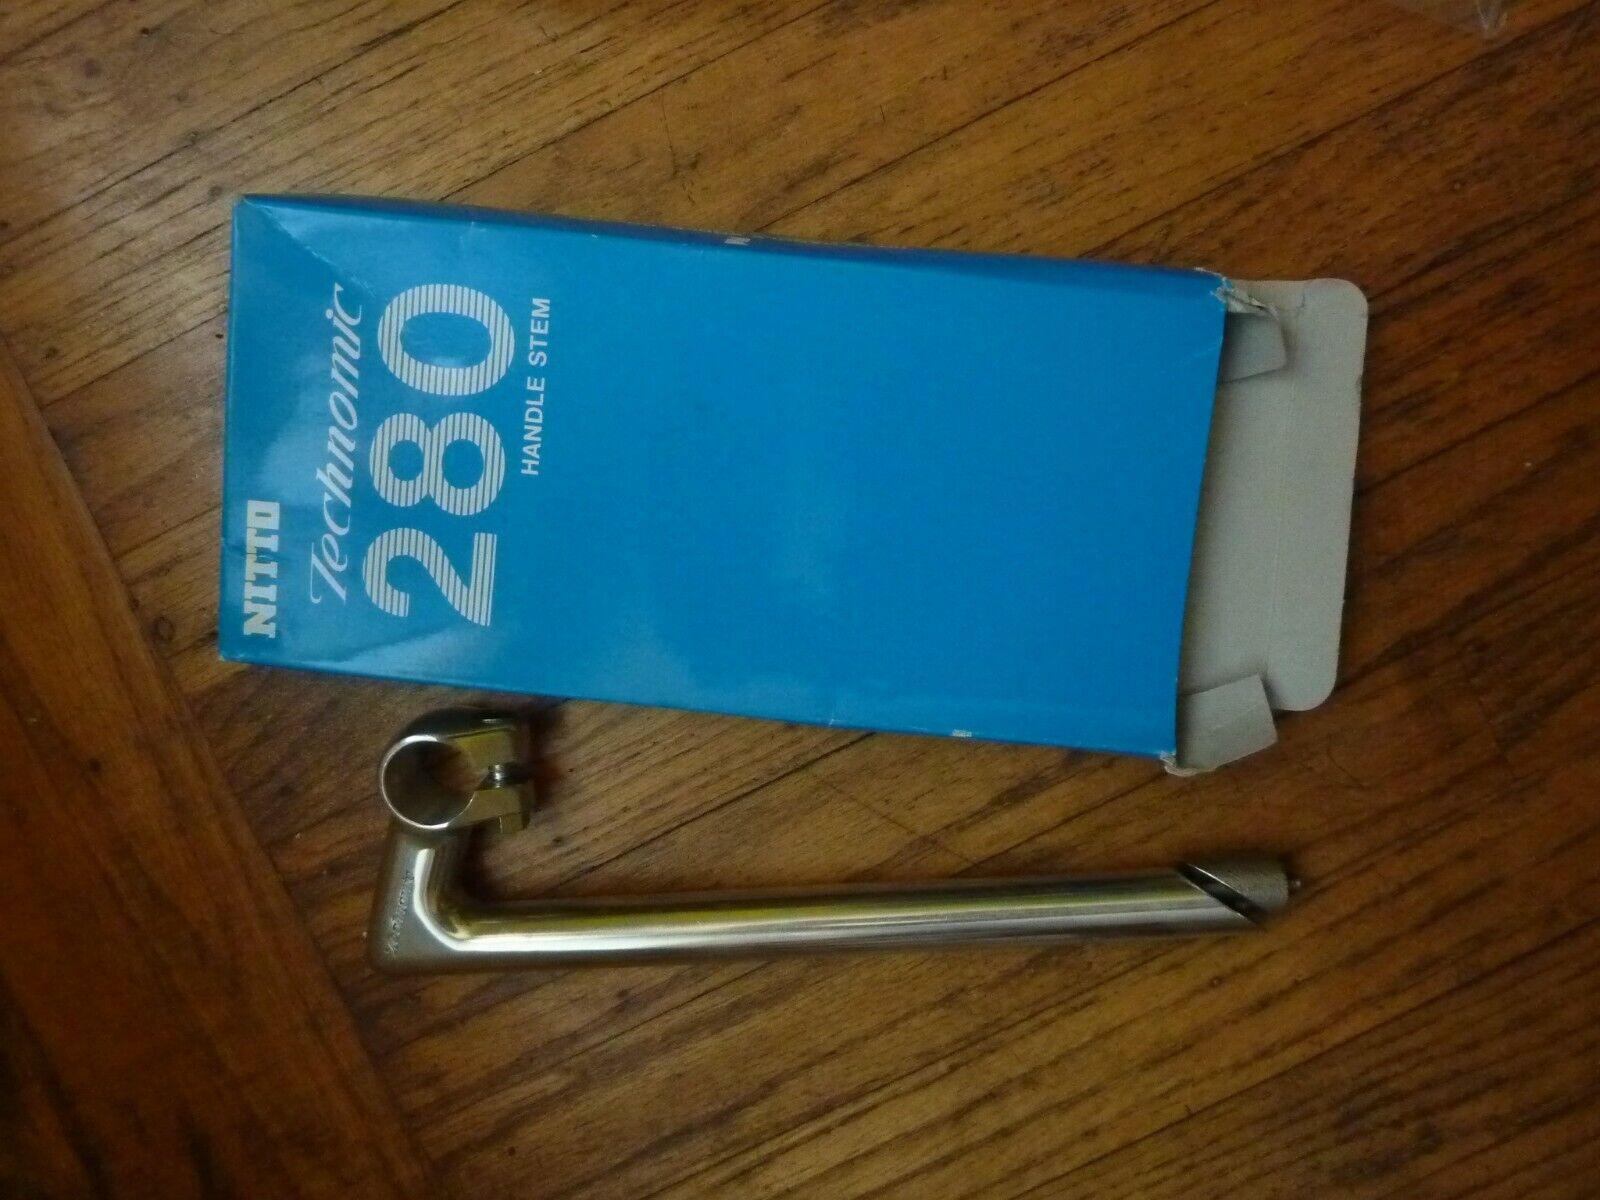 BRAND NEW  Nitto Technomic Stem 22.2 mm 25.4 mm clamp